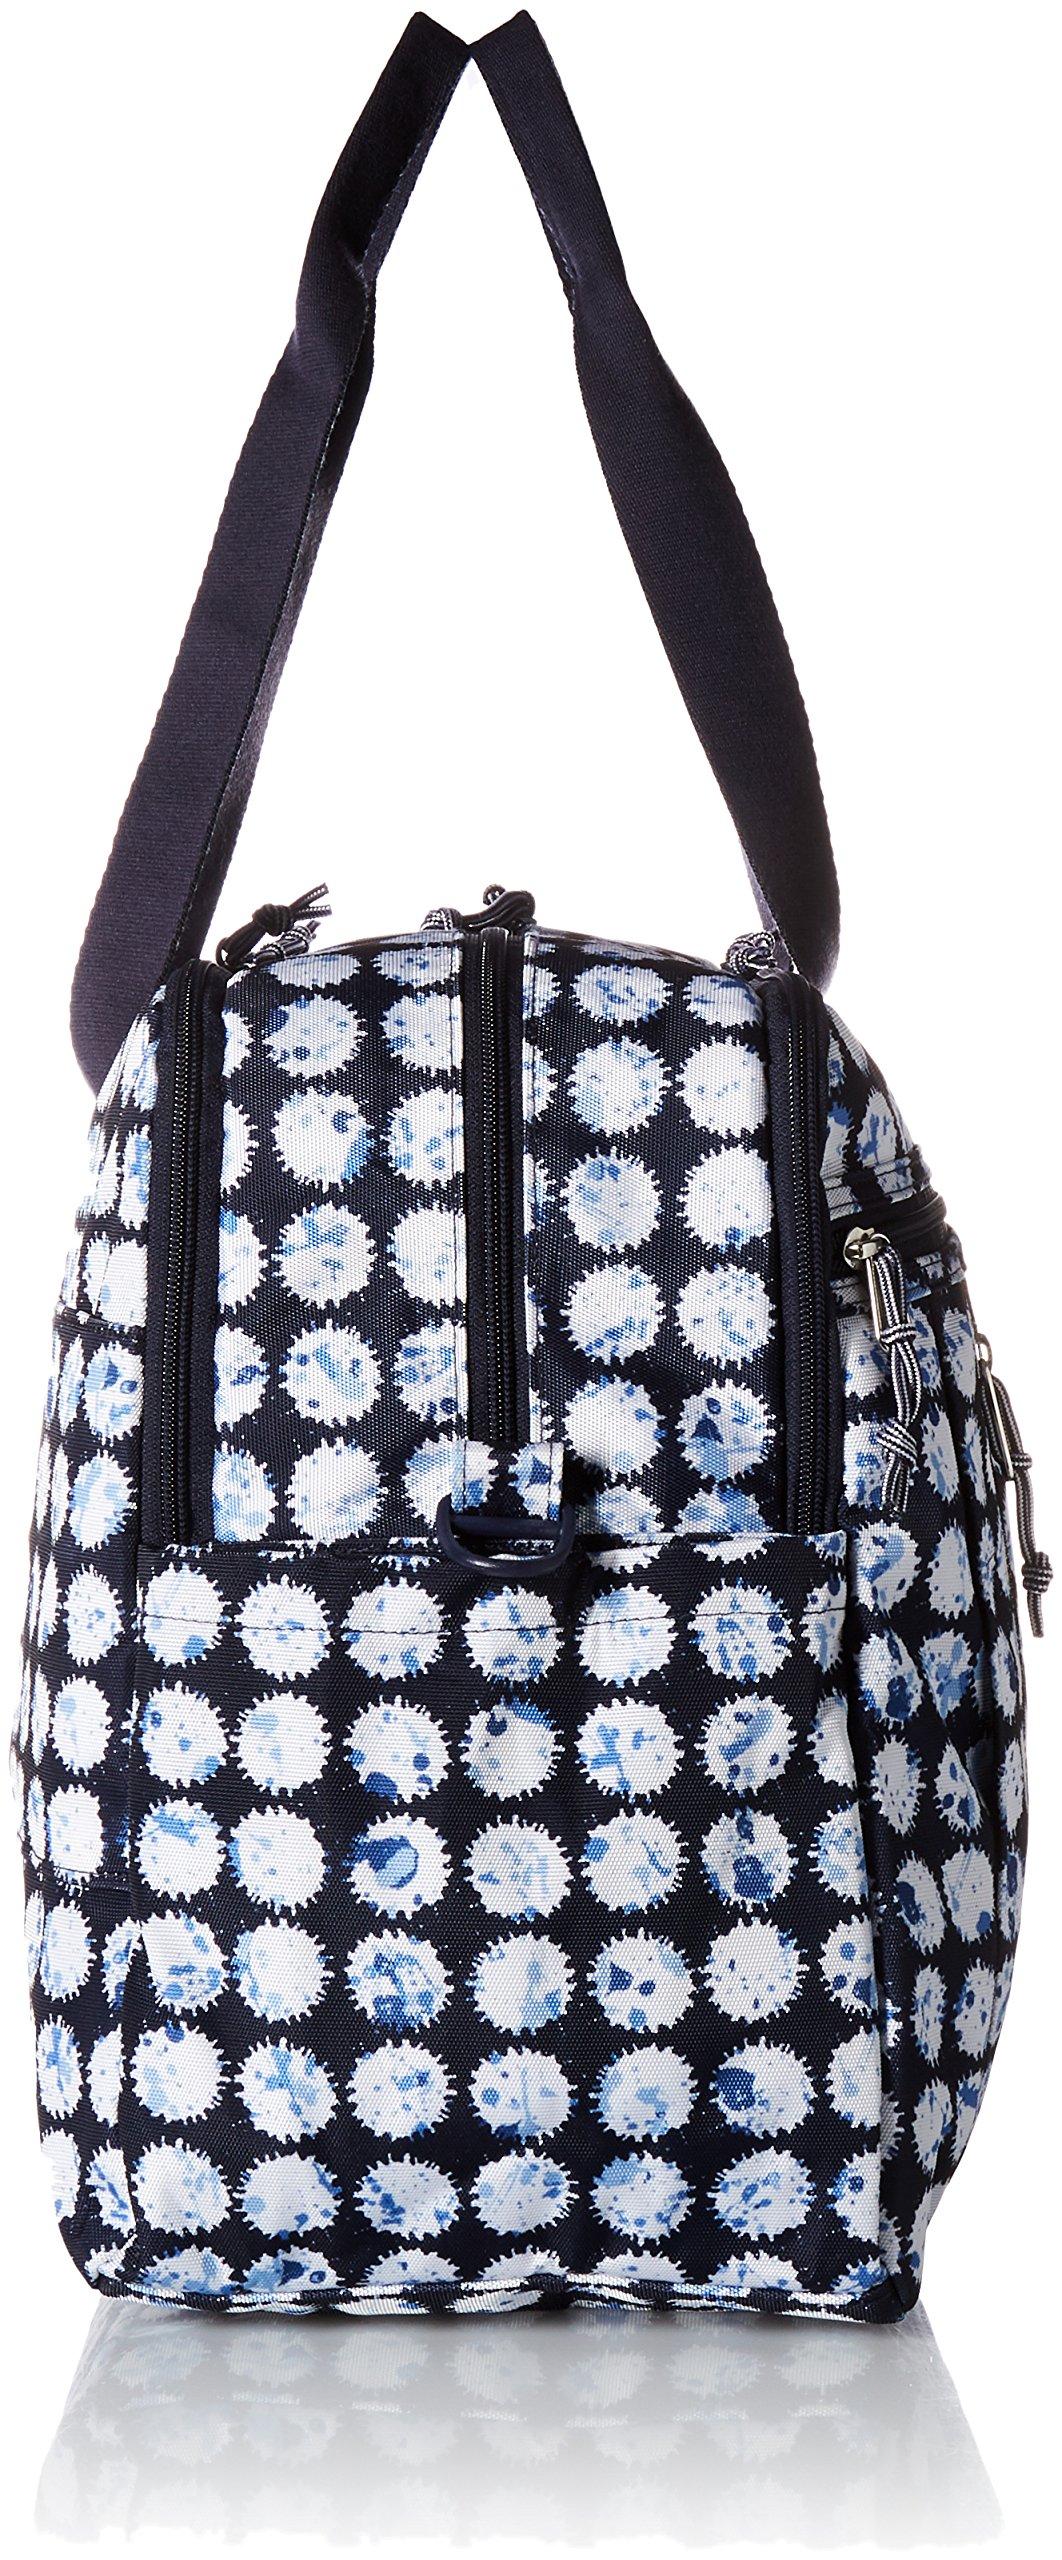 Vera Bradley Lighten up Weekender Travel Bag, Polyester, Splash Dot by Vera Bradley (Image #3)